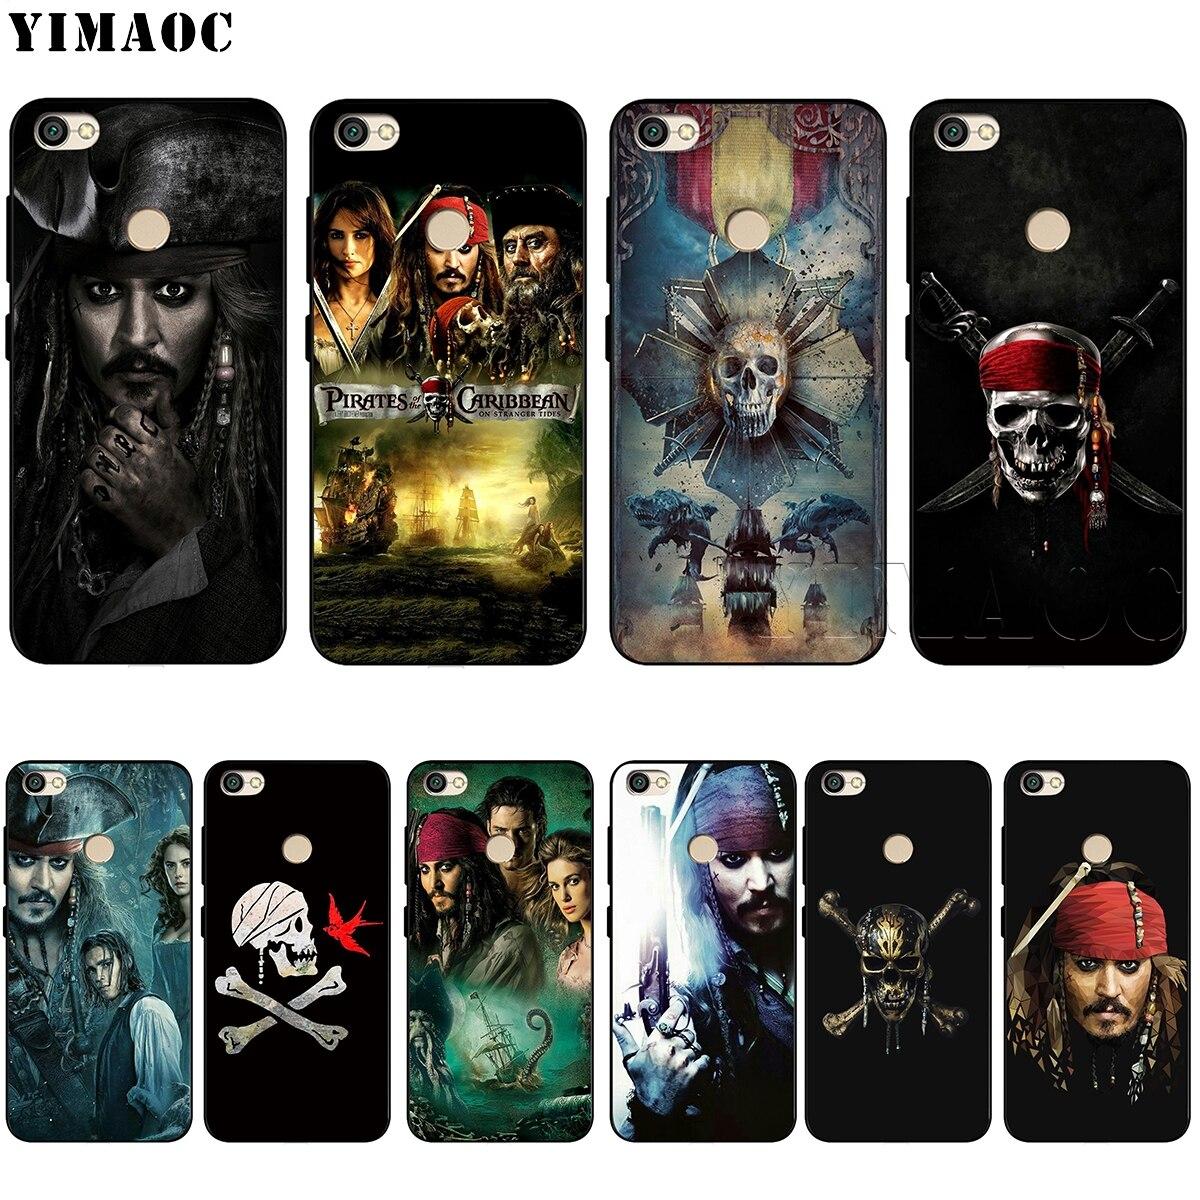 YIMAOC Pirates Of The Caribbean Soft Silicone Case for Xiaomi Redmi Note 4 4X 4A 5 5A 6 MI A1 mi6 Prime Plus